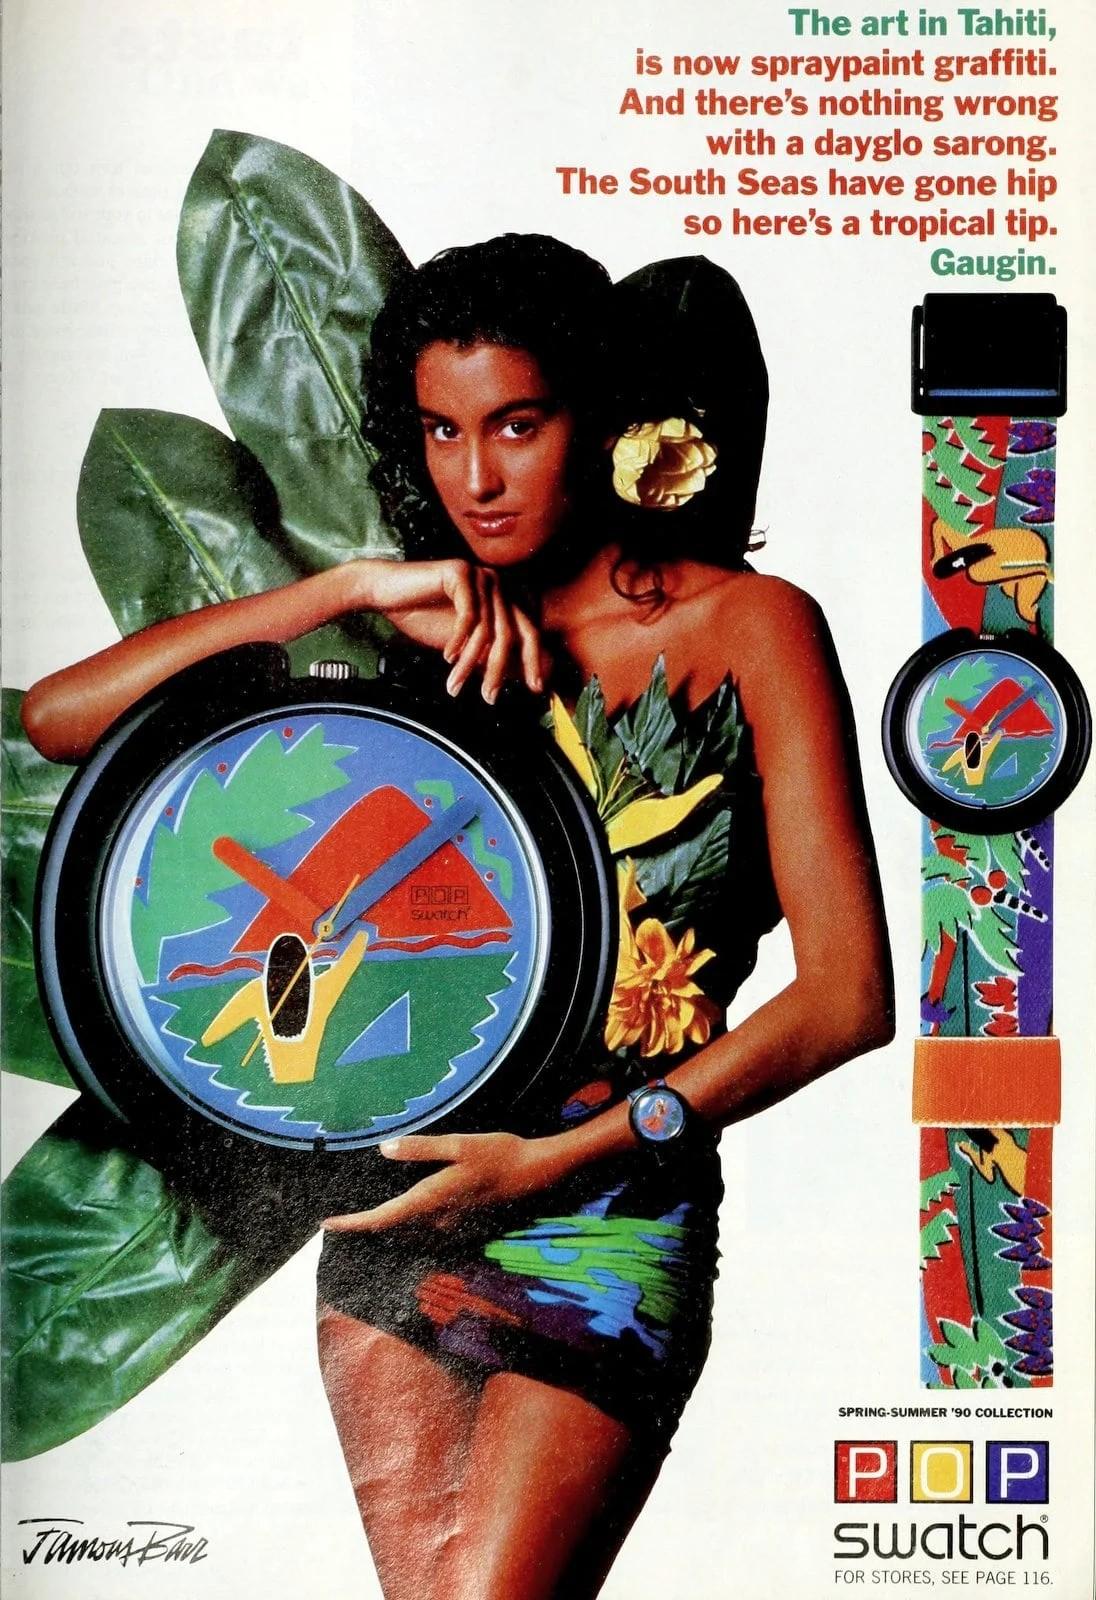 pop-swatch-gaugin-pattern-1990.webp